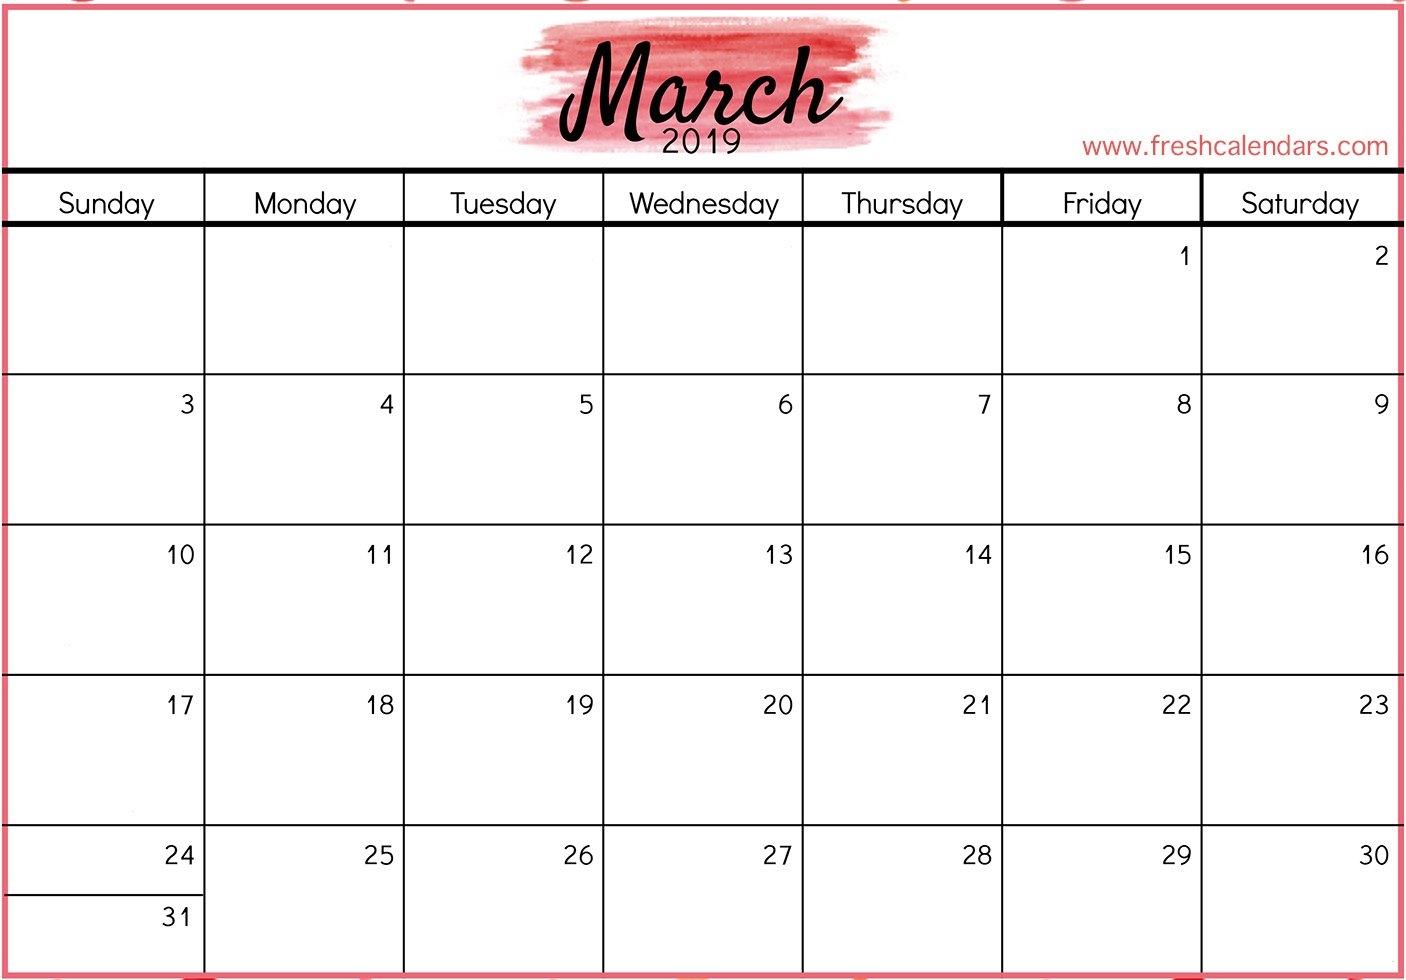 March 2019 Printable Calendars - Fresh Calendars A Calendar For March 2019